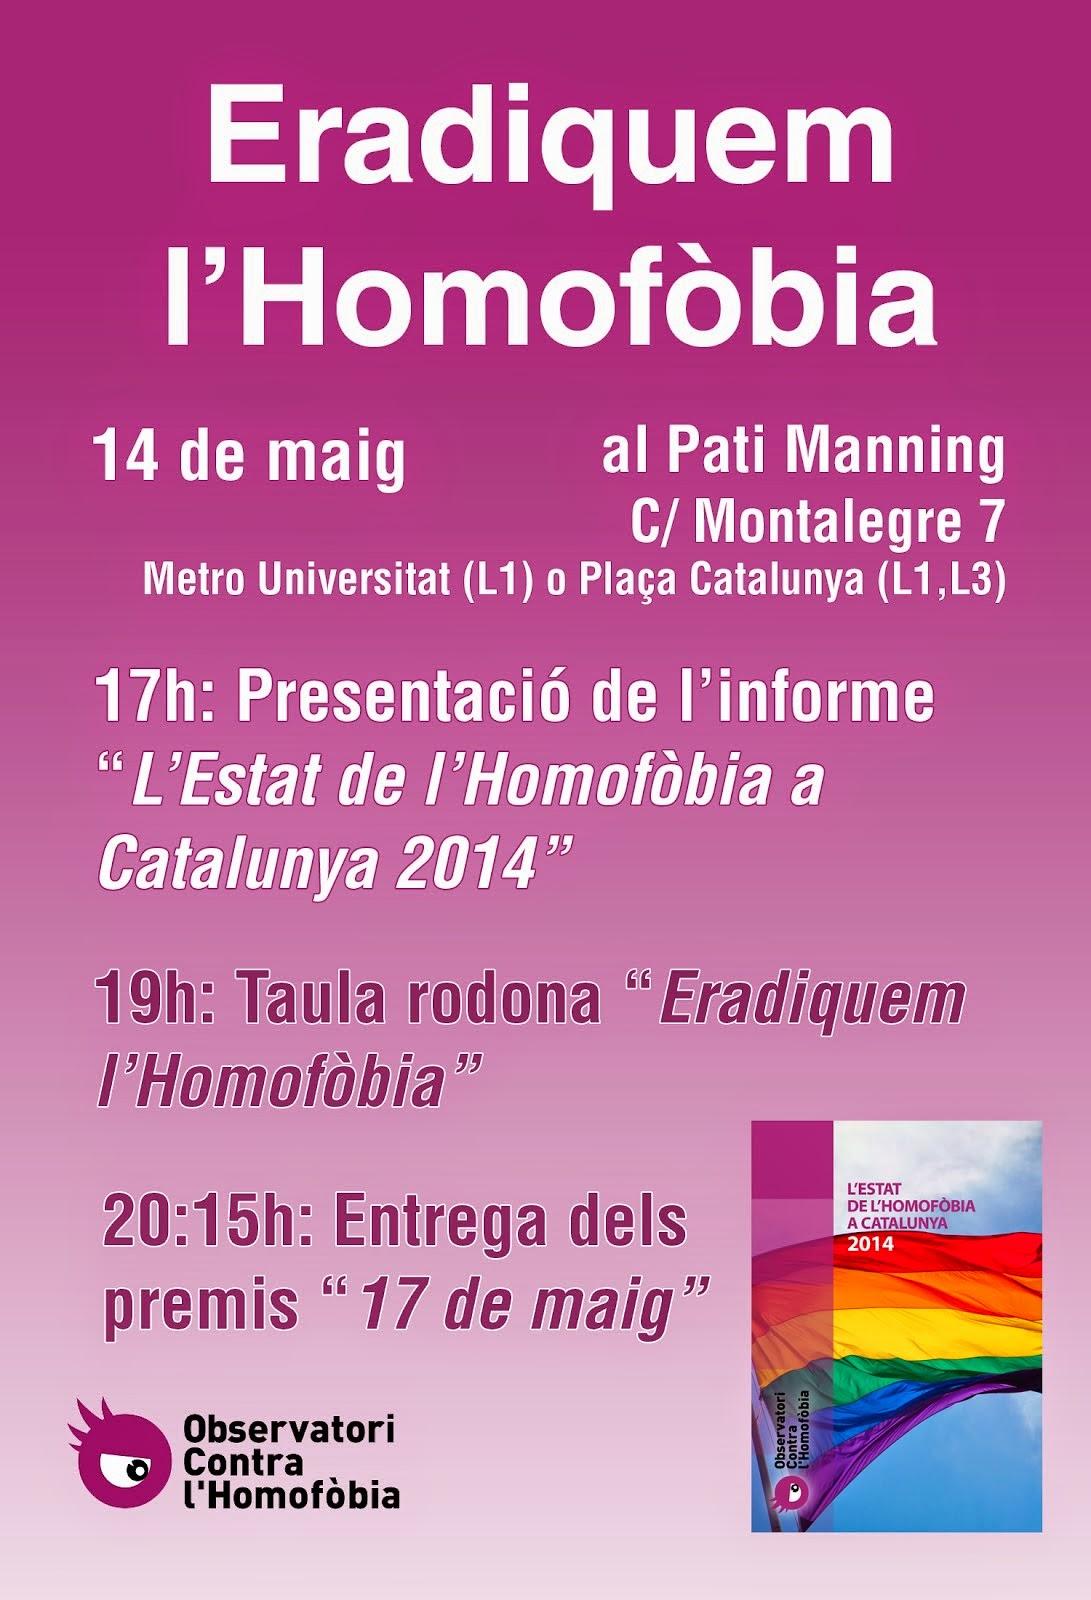 ERADIQUEM L'HOMOFÒBIA